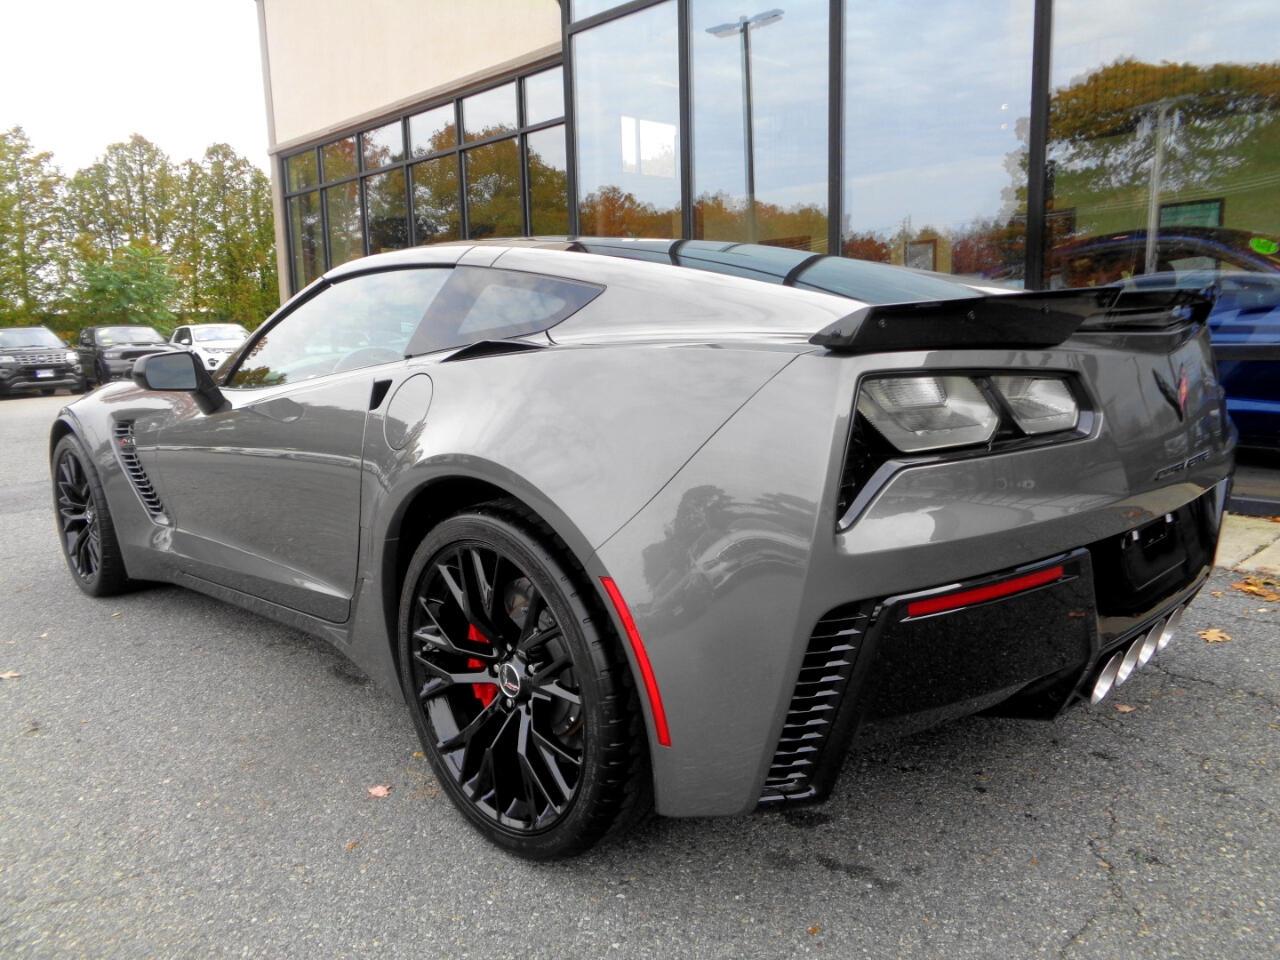 2015 Gray Chevrolet Corvette Z06 3LZ   C7 Corvette Photo 6